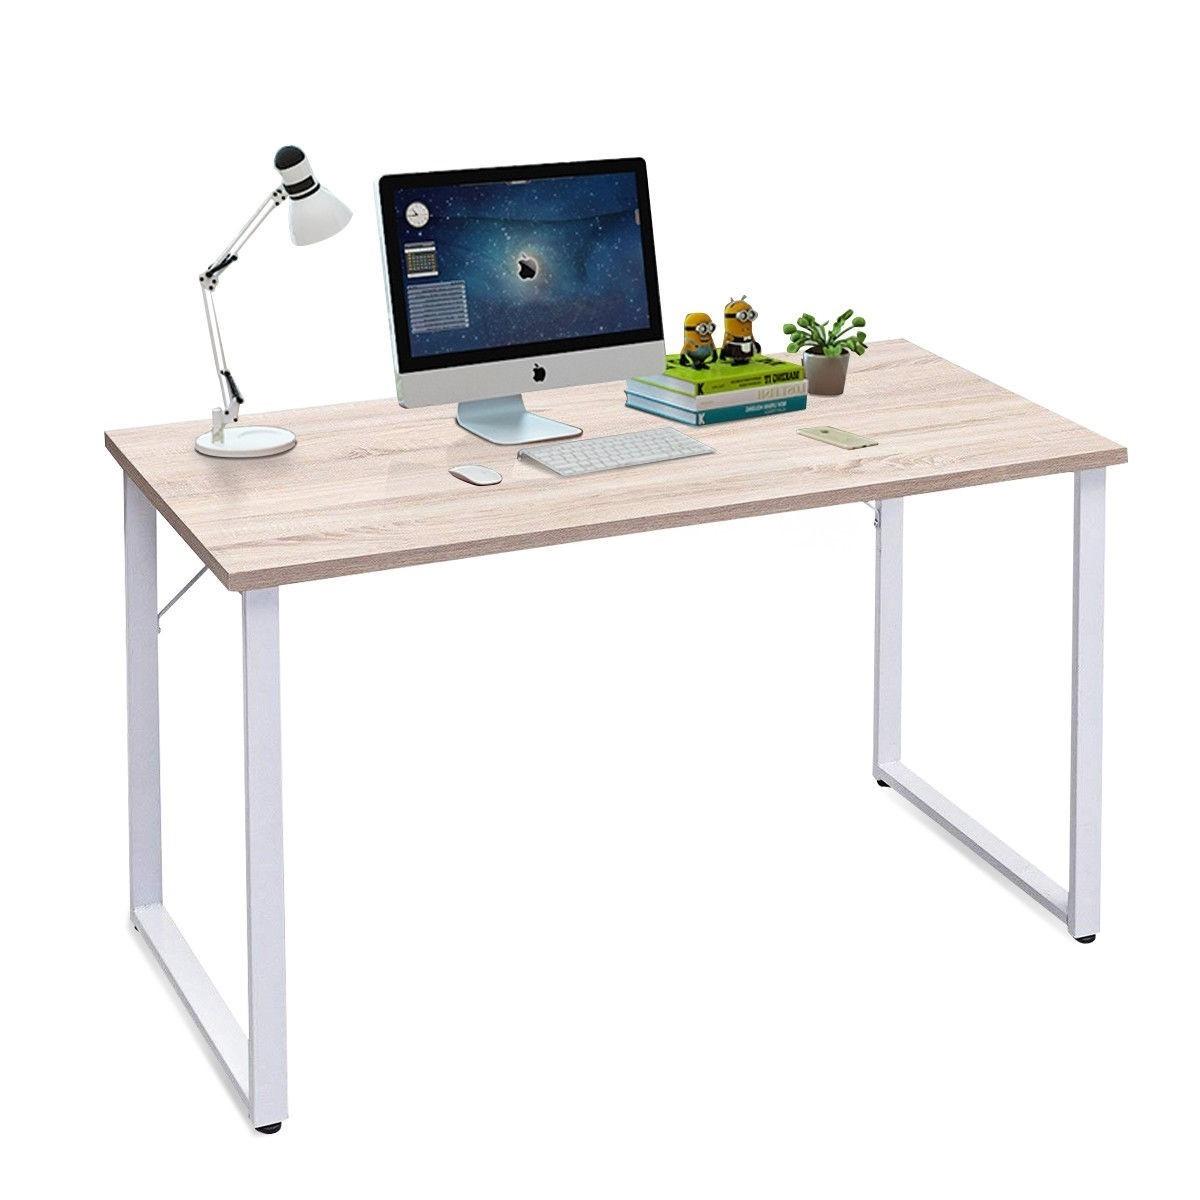 - Modern White Metal Frame Laptop Computer Desk With Natural Wood